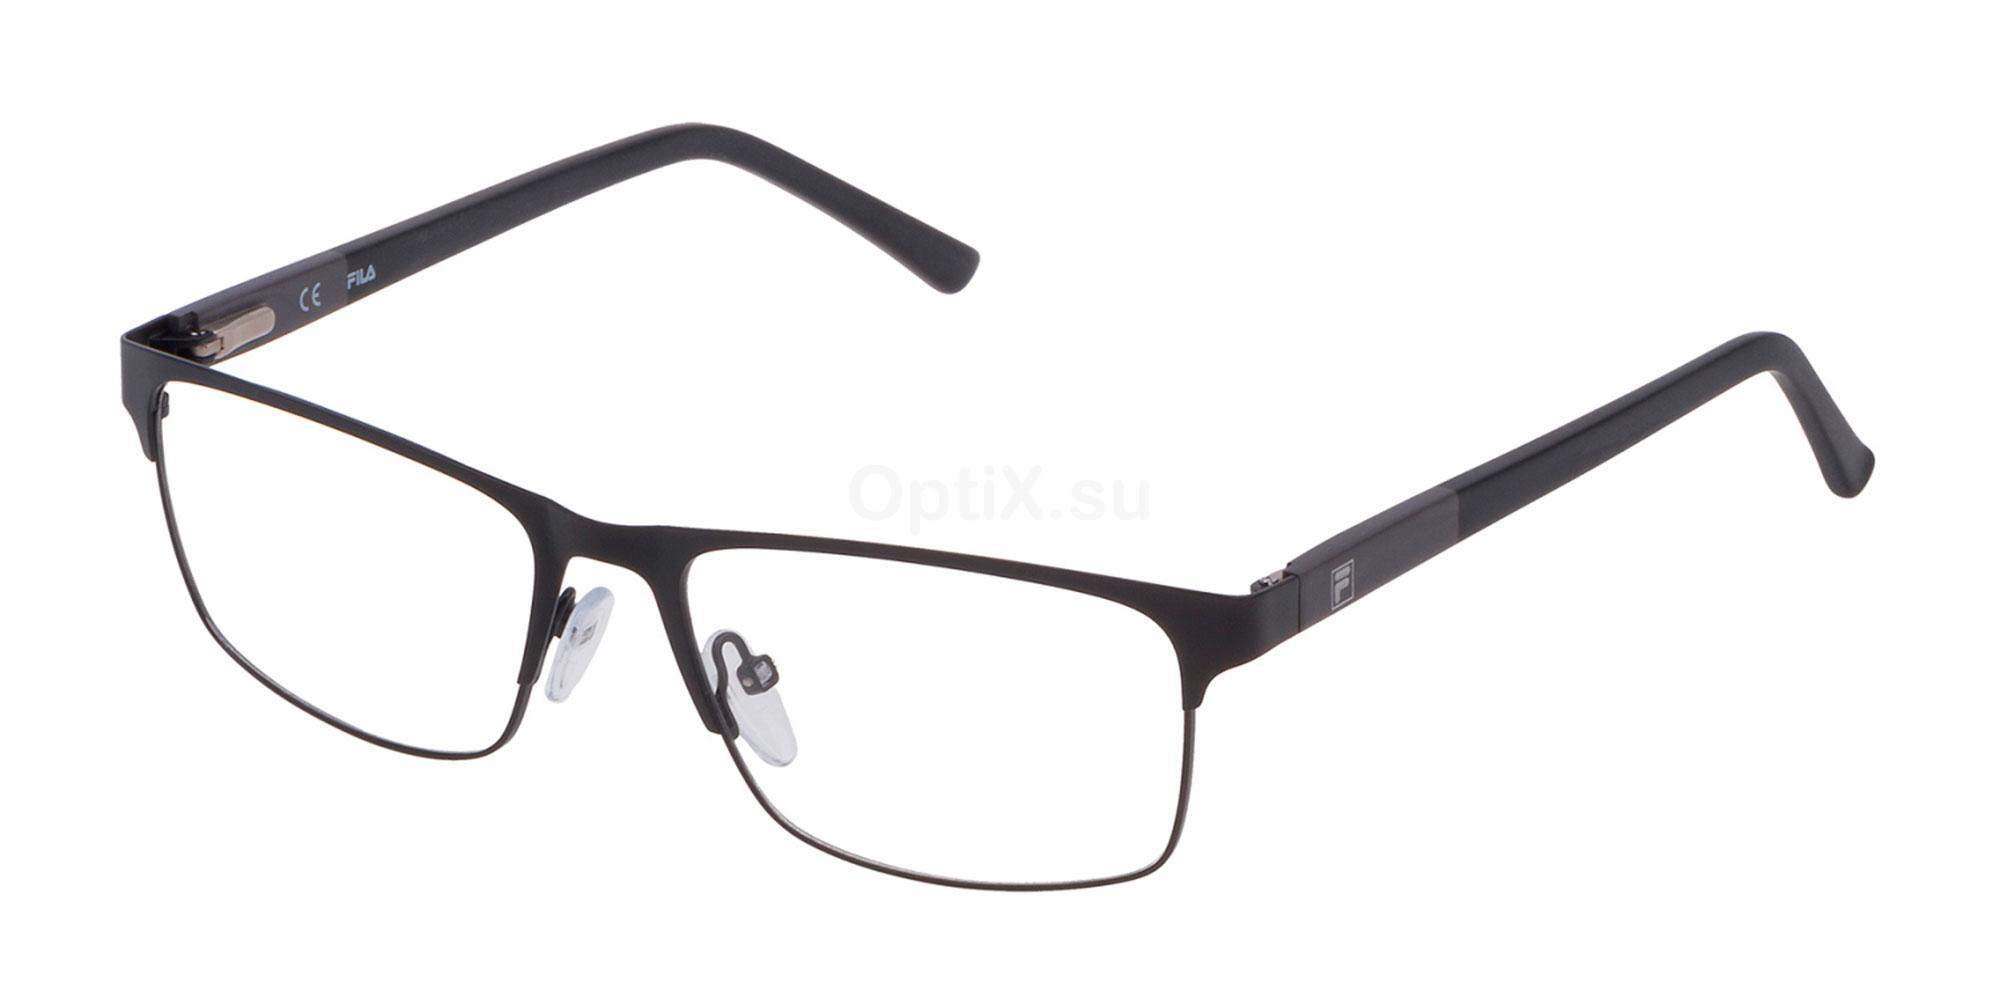 0531 VF9836 Glasses, Fila